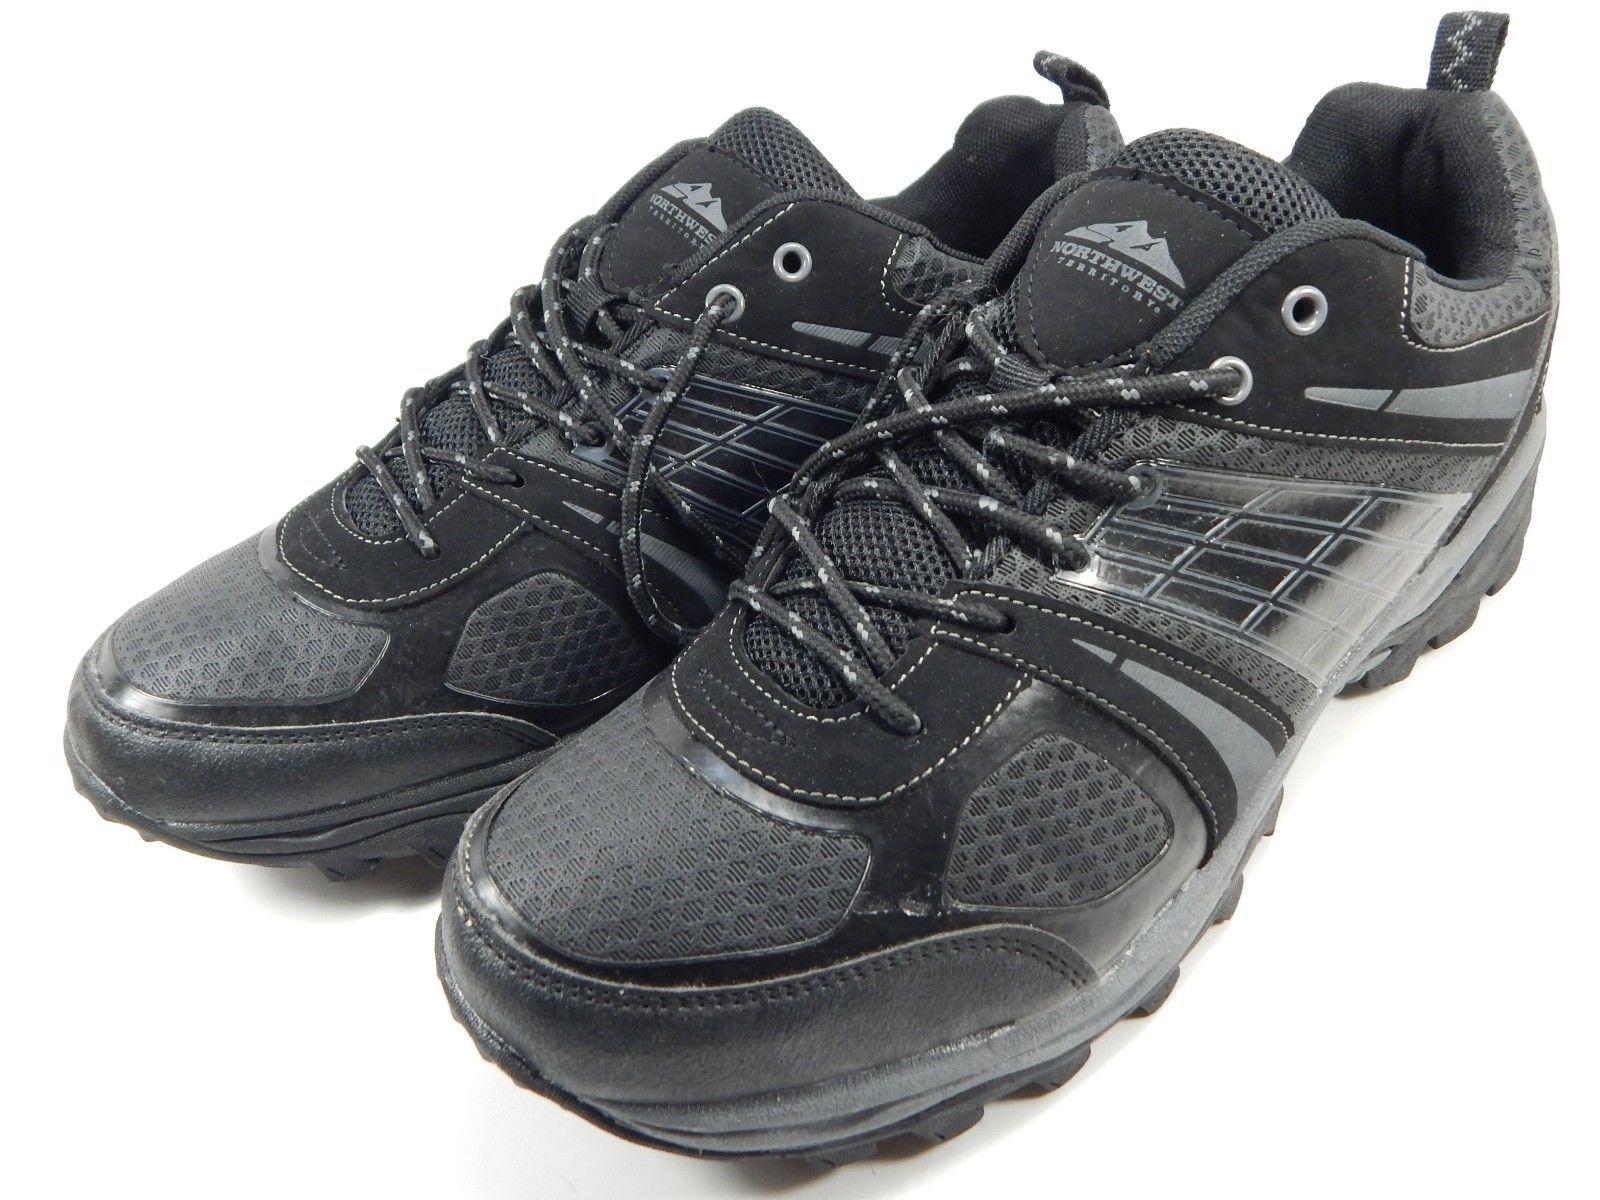 Northwest Territory Trailhawker Low Men's Trail Shoes Size US 12 M (D) EU 46